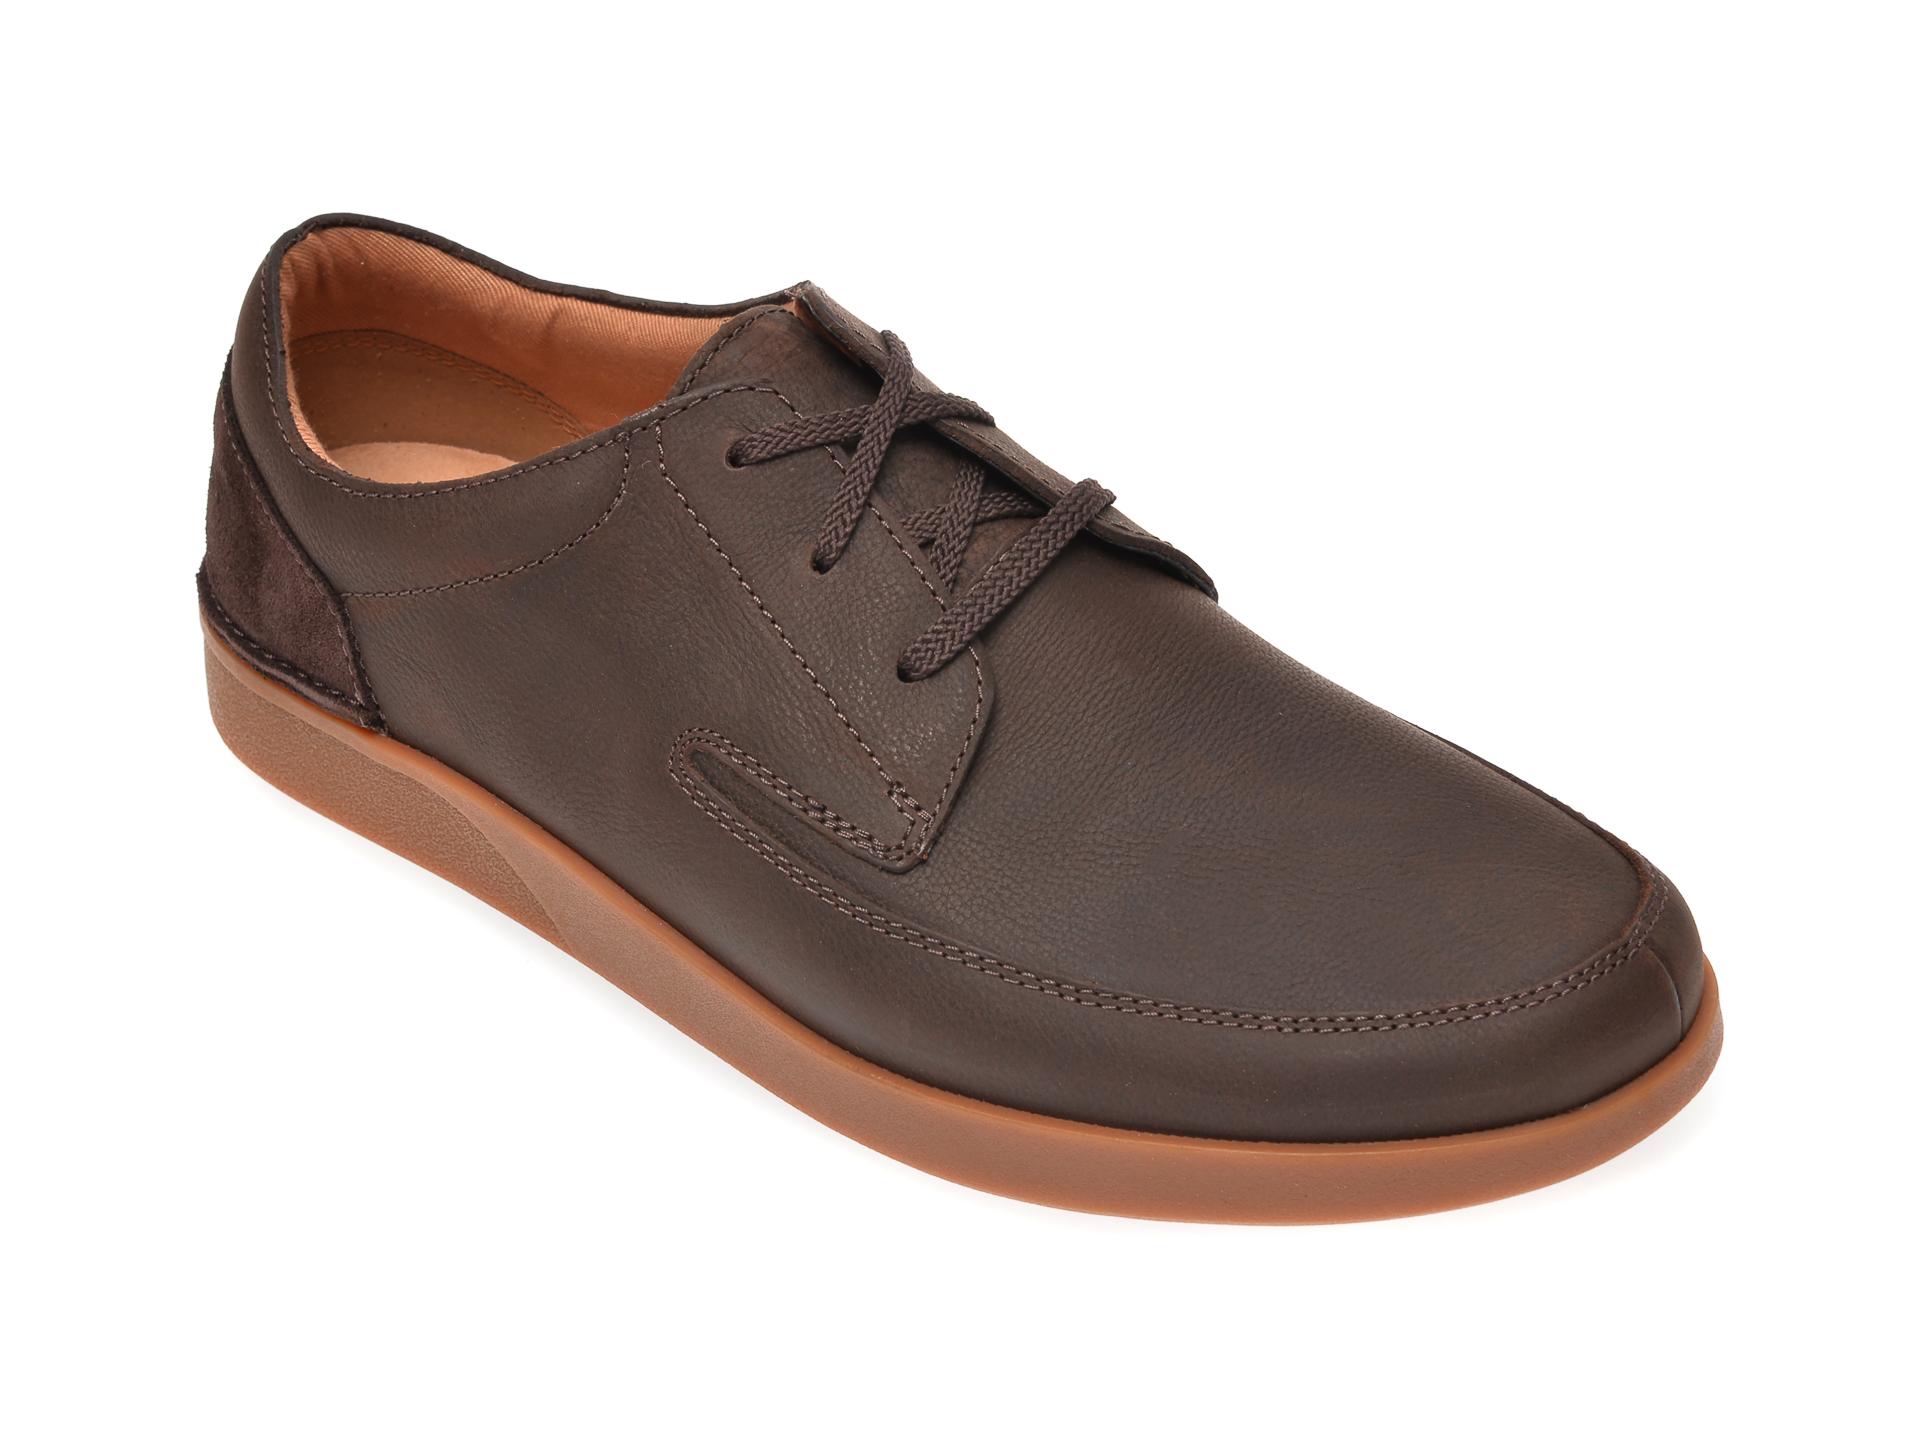 Pantofi CLARKS maro, Oakland Craft, din piele naturala